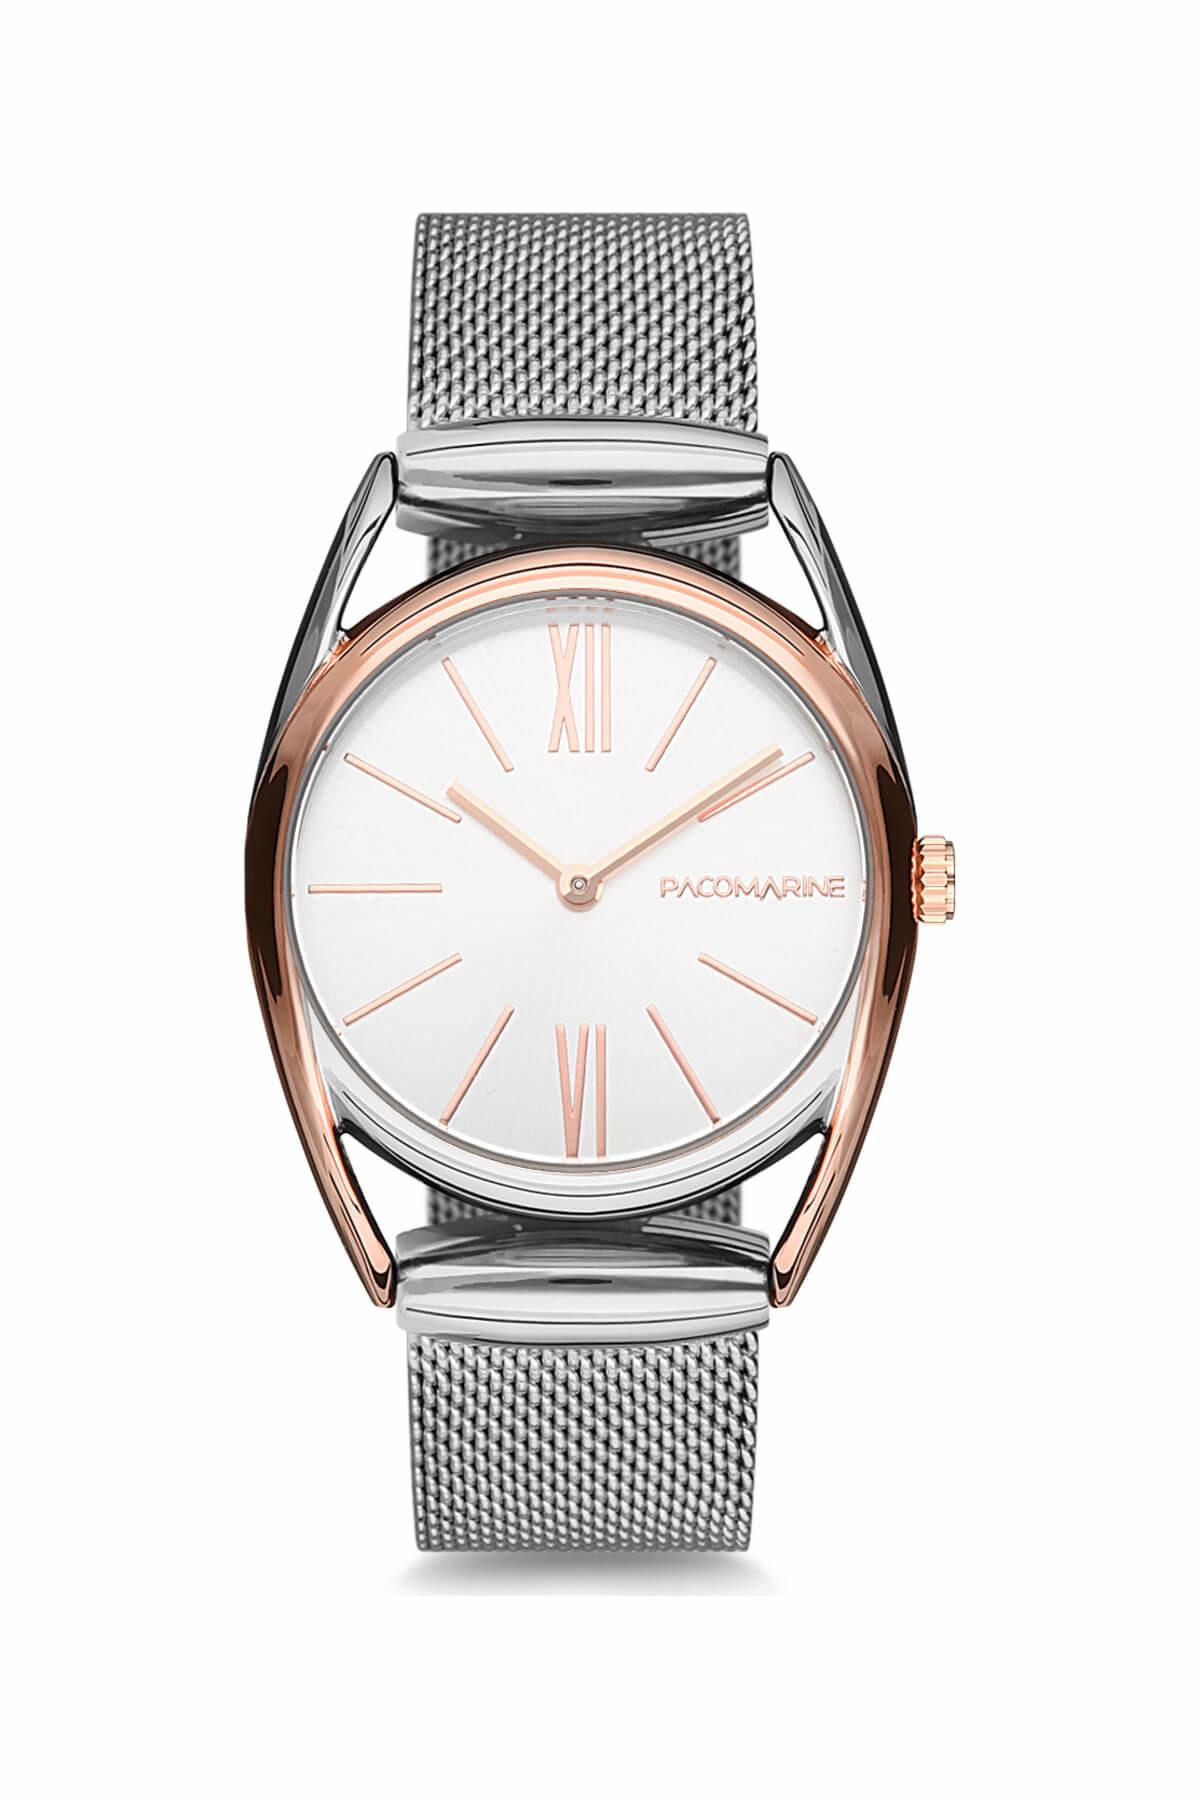 Pacomarine Kadın Kol Saati 61152-01 1